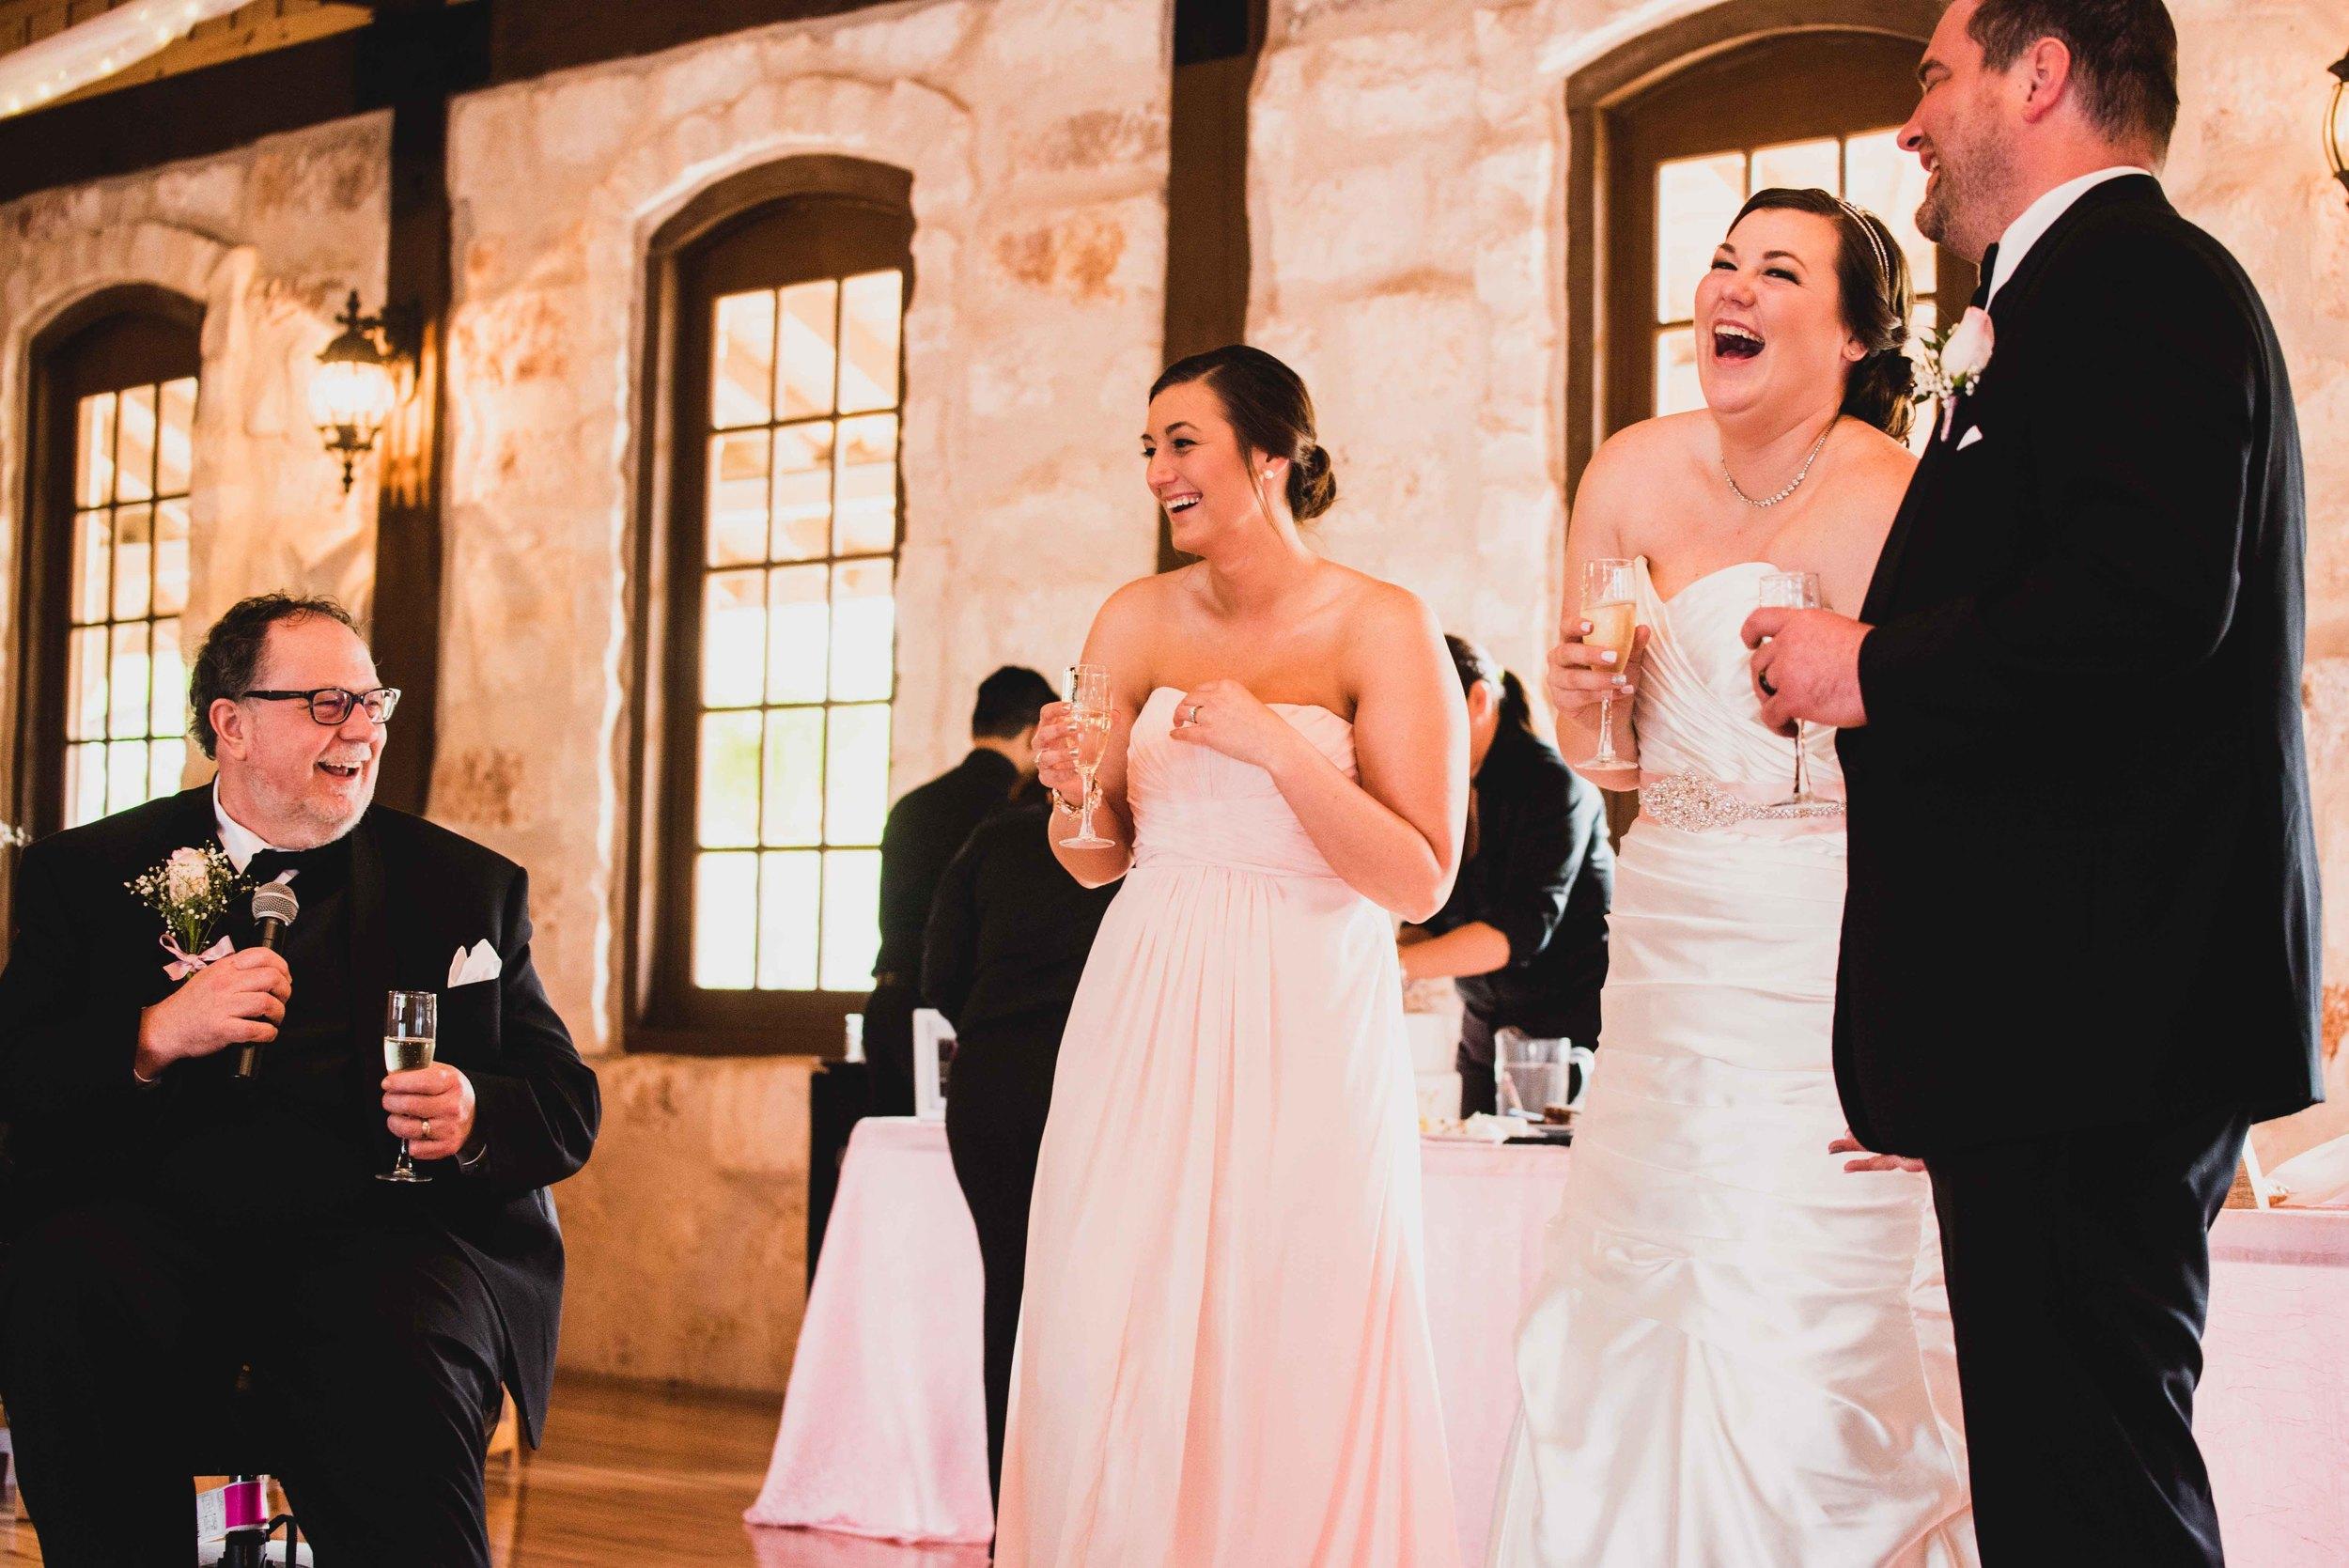 Dallas Wedding - Heritage Springs - Katie and Dustin - Dad Speech